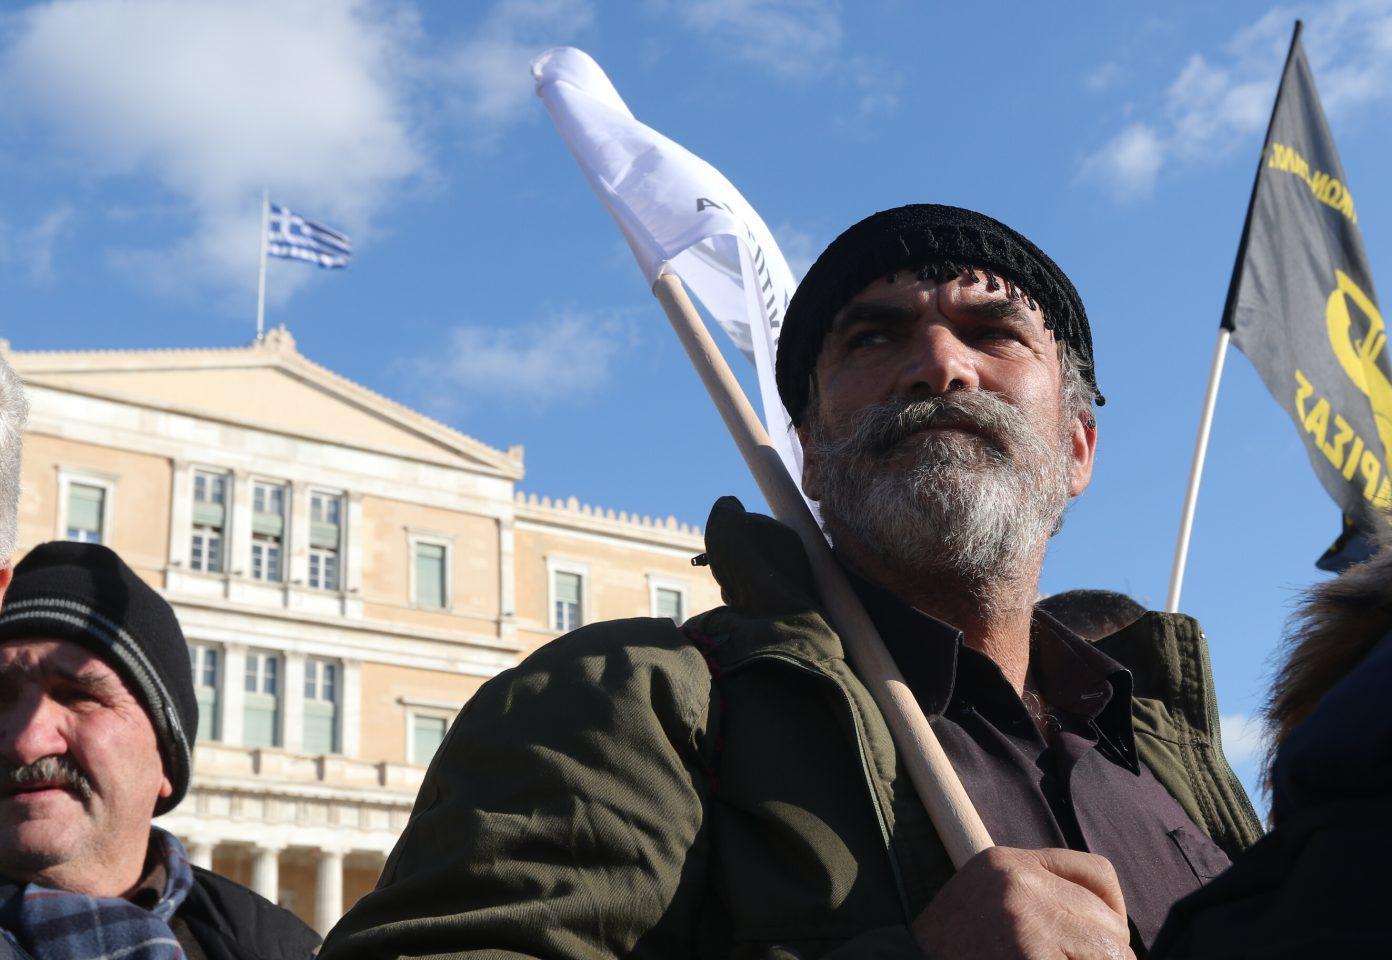 agrotes9-500 Ολοκληρώθηκε το παναγροτικό συλλαλητήριο [εικόνες]